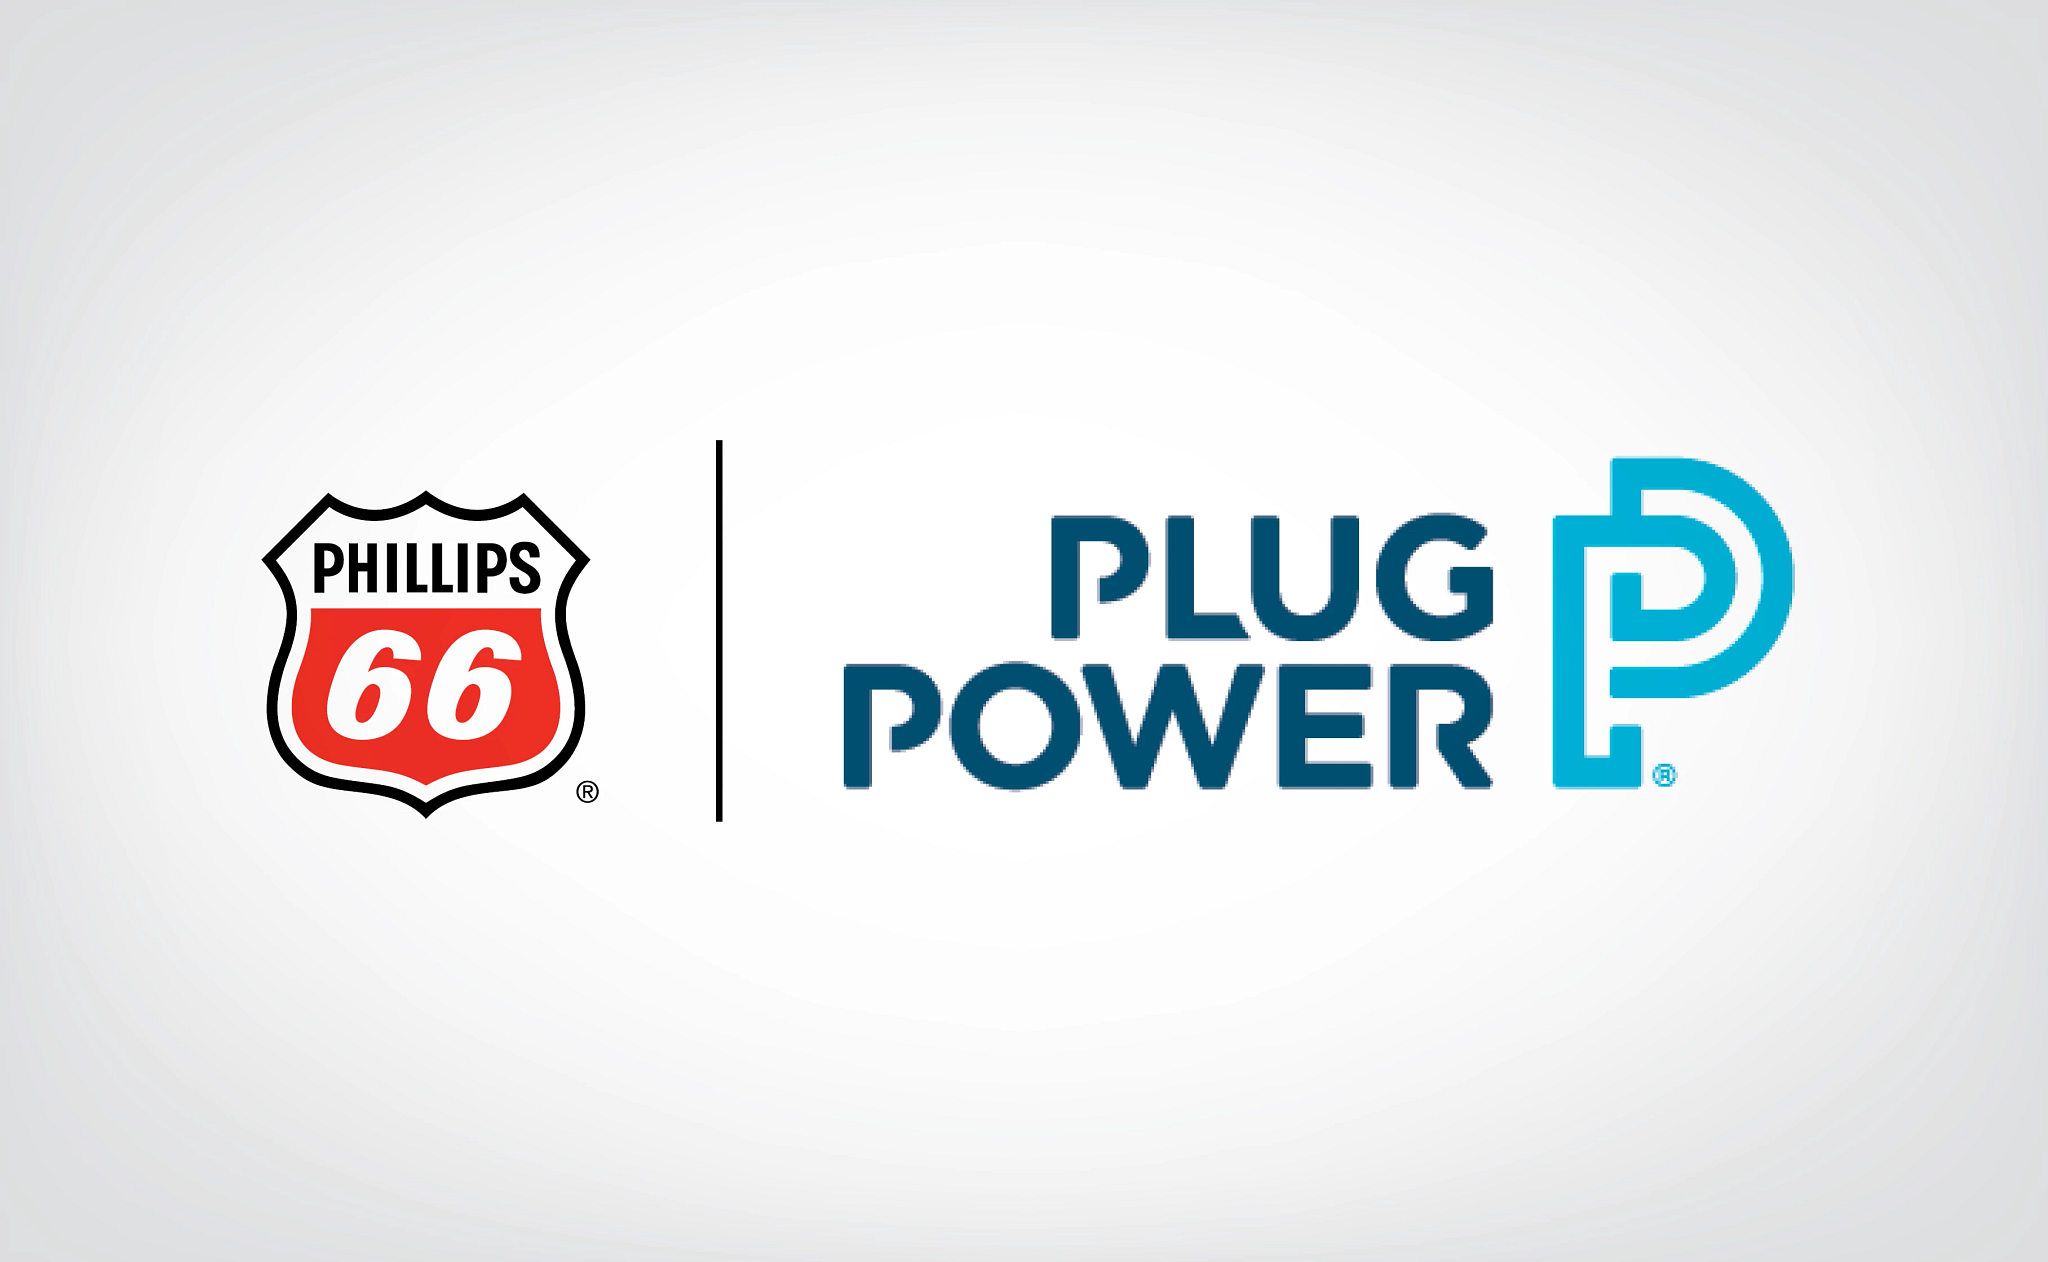 21-0020_080_Plug Power MOU DotCom thumbnail.png